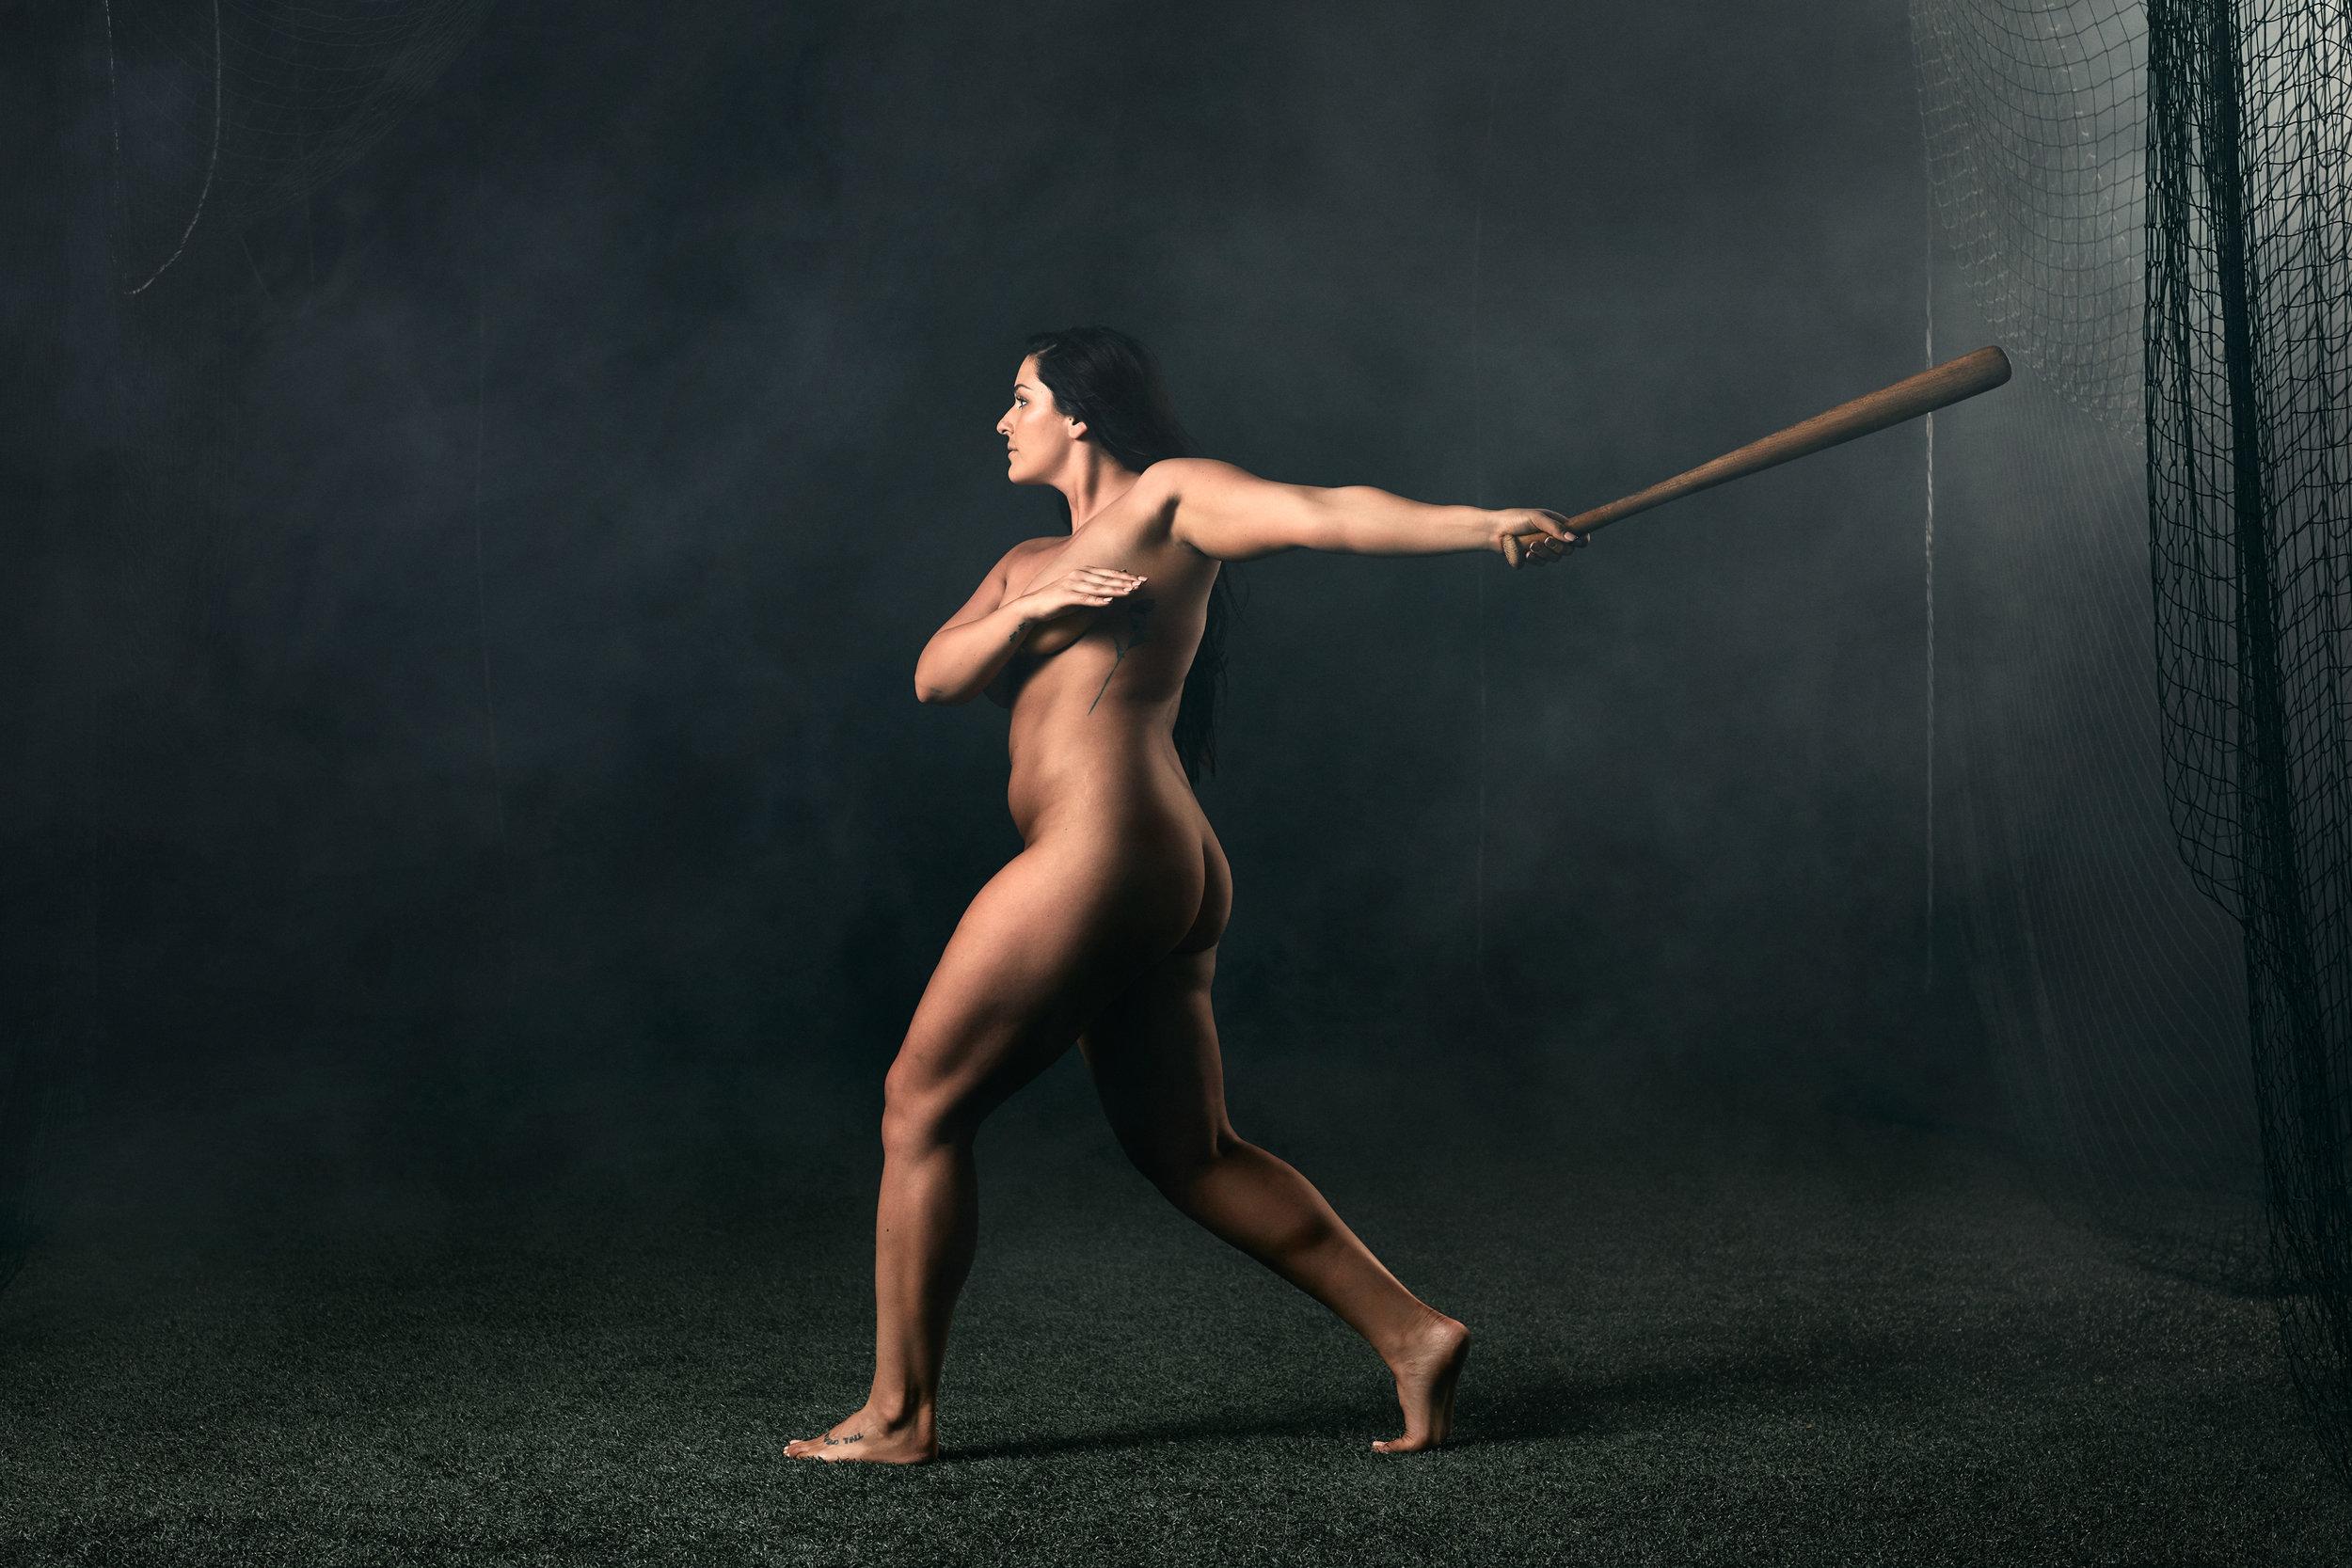 Lauren chamberlain nude